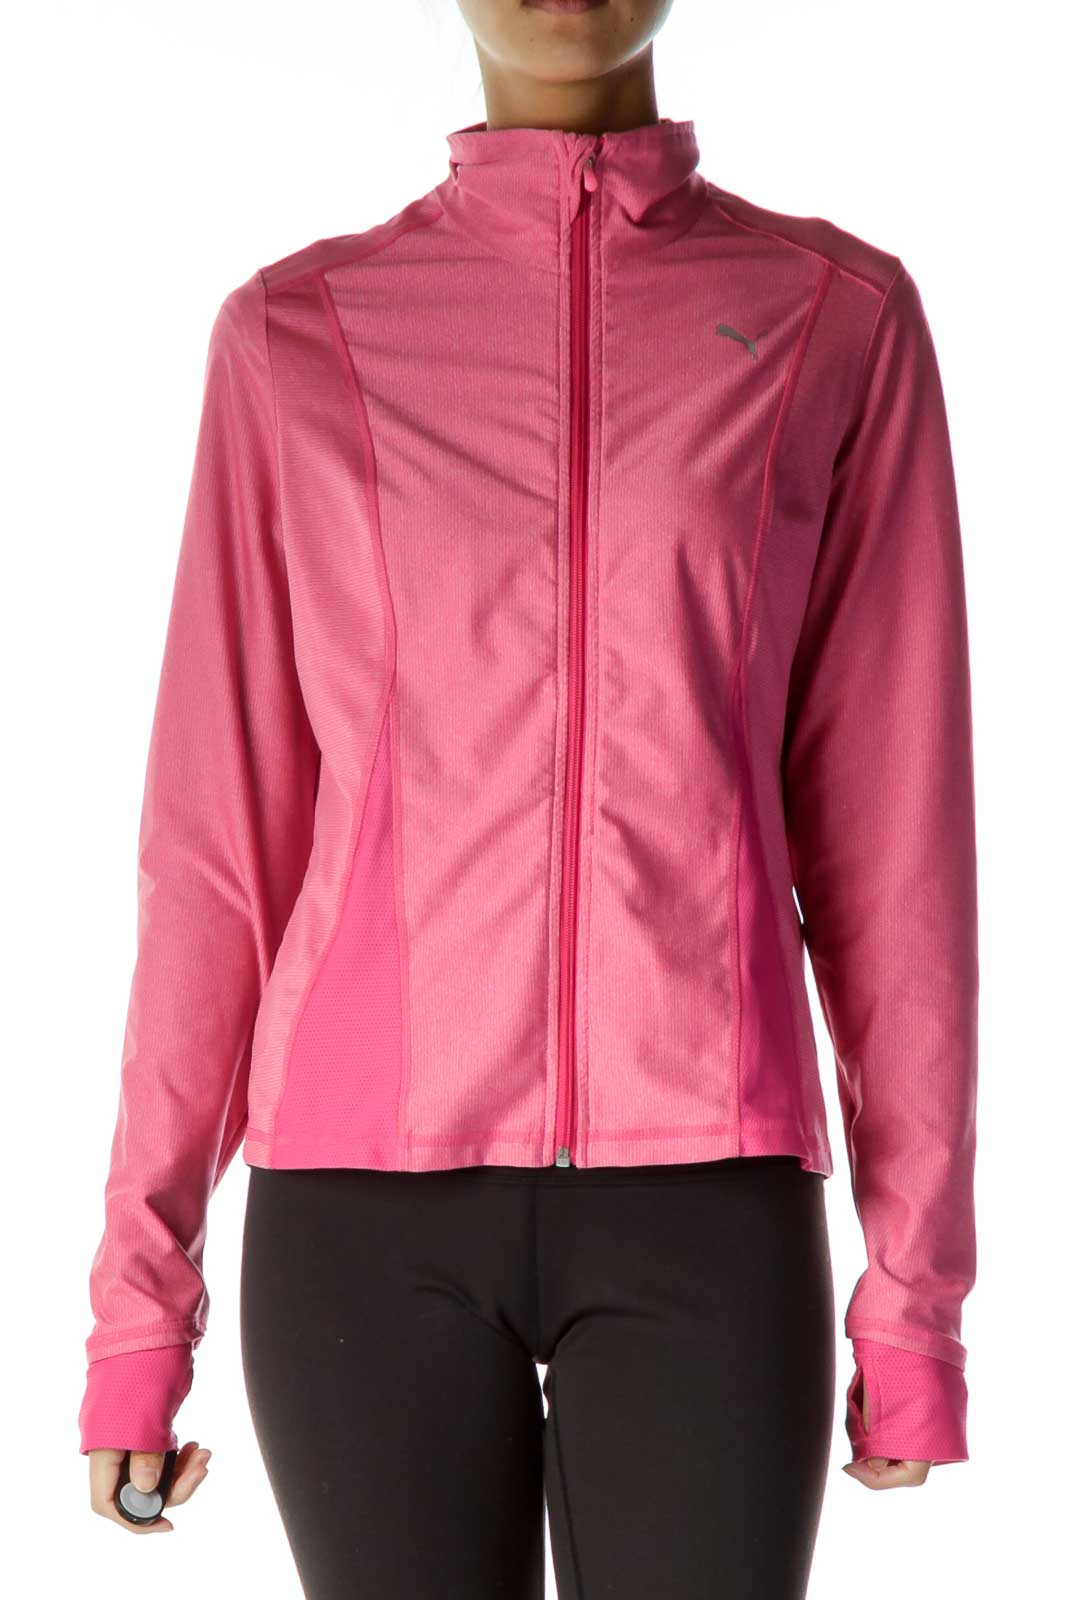 Pink Zipper Athletic Jacket Front